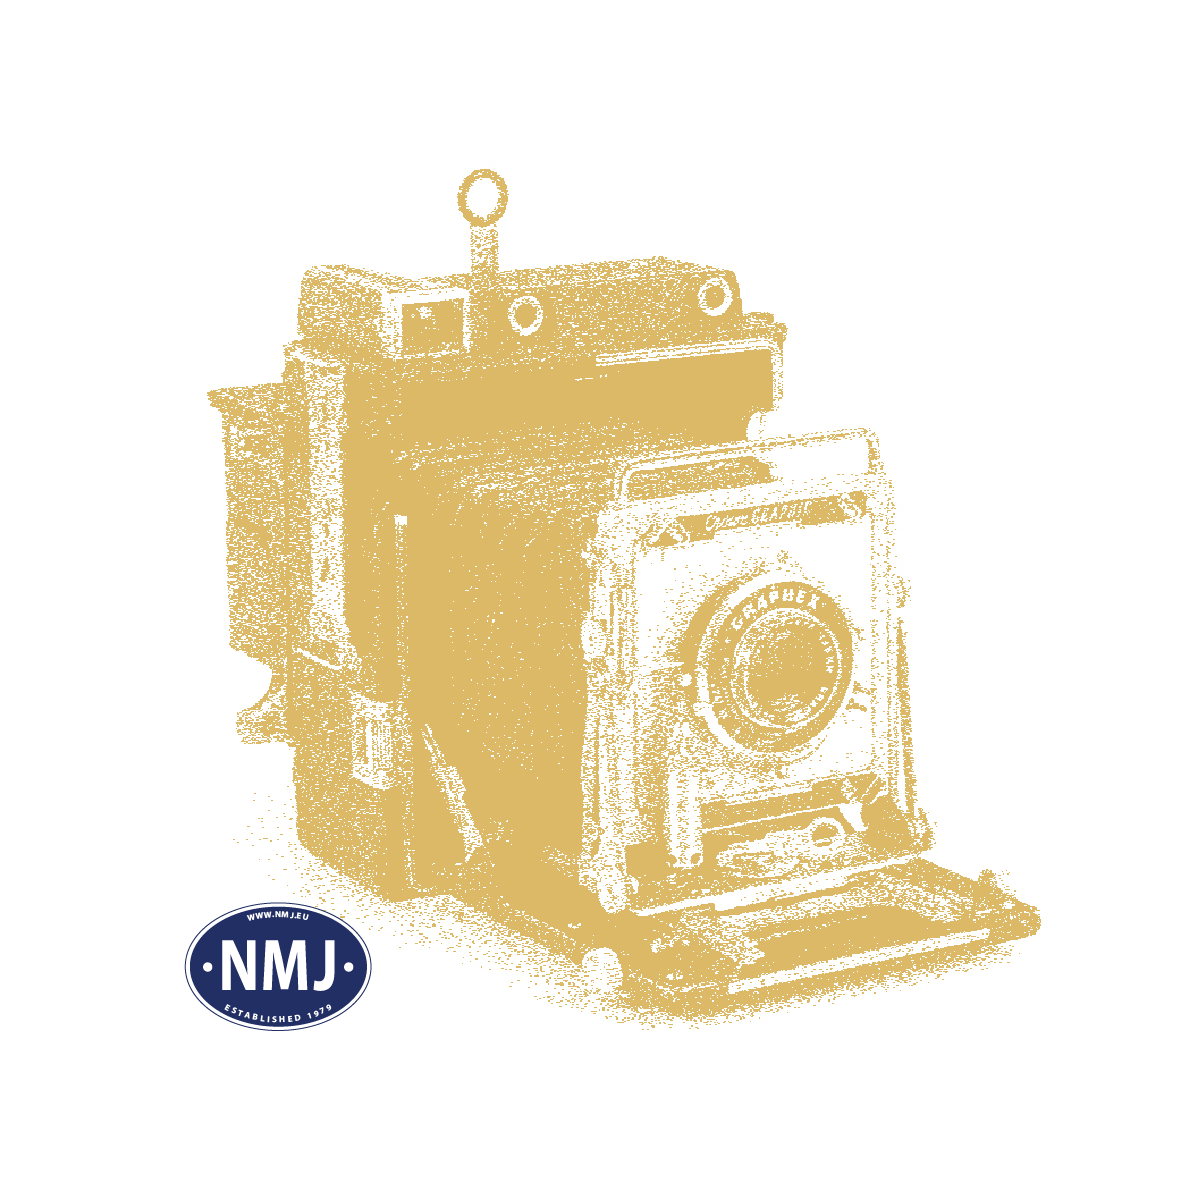 NMJT106.505 - NMJ Topline Personenwagen B3-6.25538 der NSB, rot/grau/silber